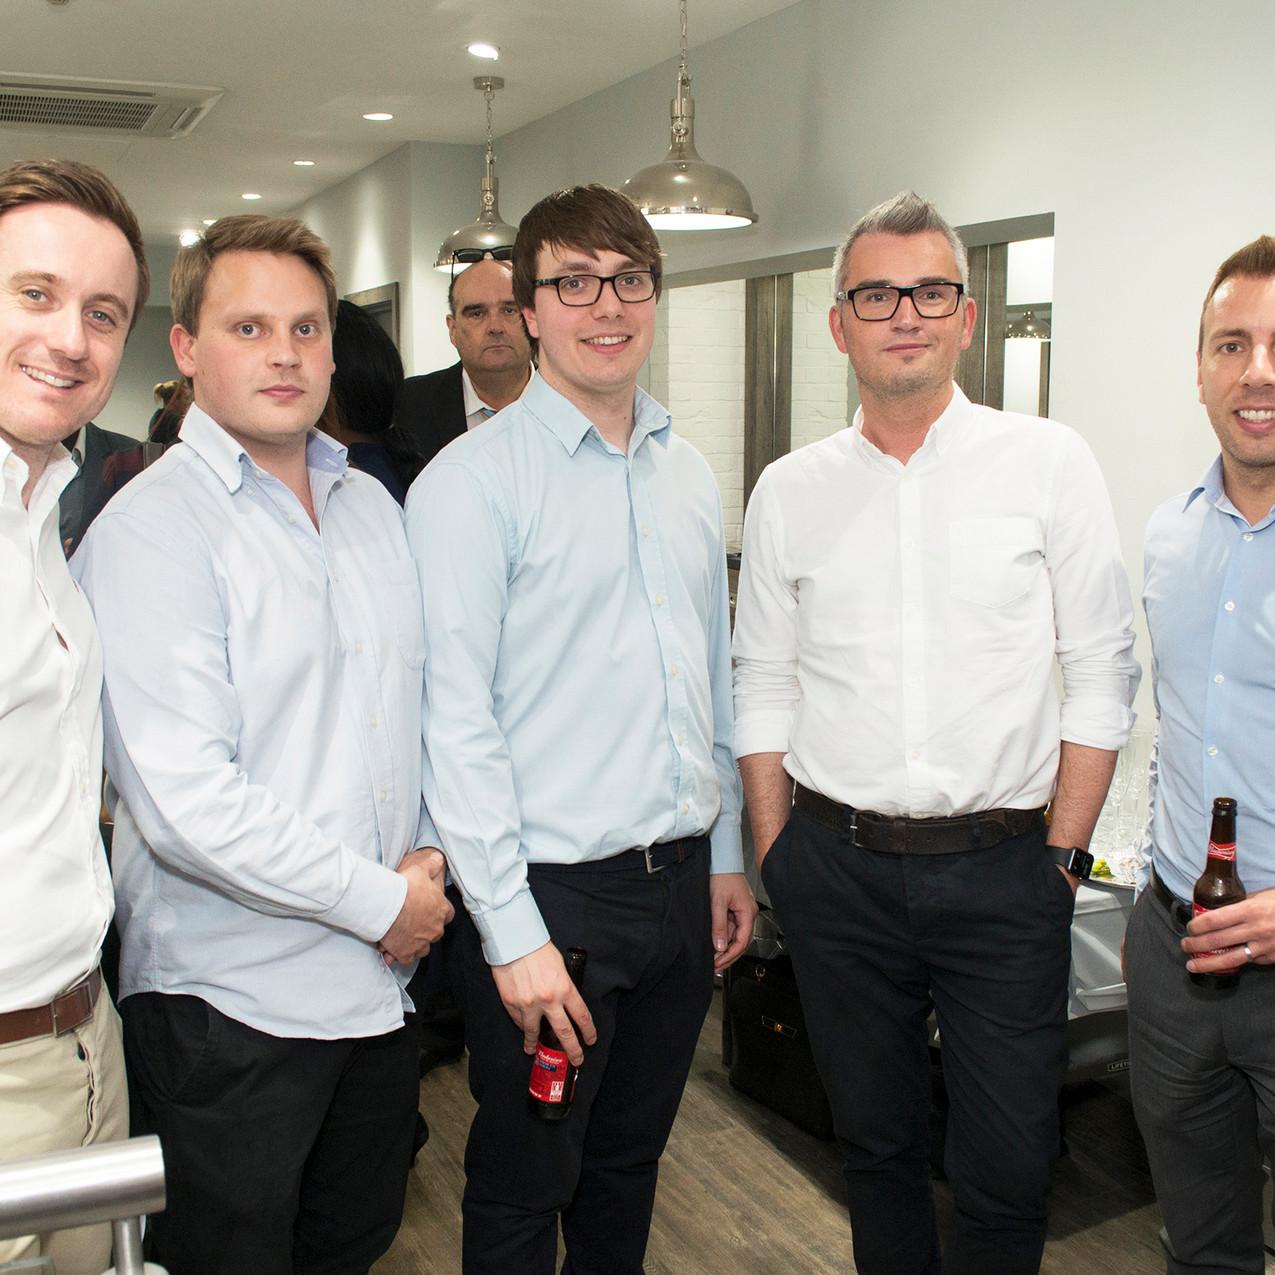 Tom Fletcher, Oliver Scott-Petrie, Richard Sweetman, Luke Daniels, Chris Hurlston